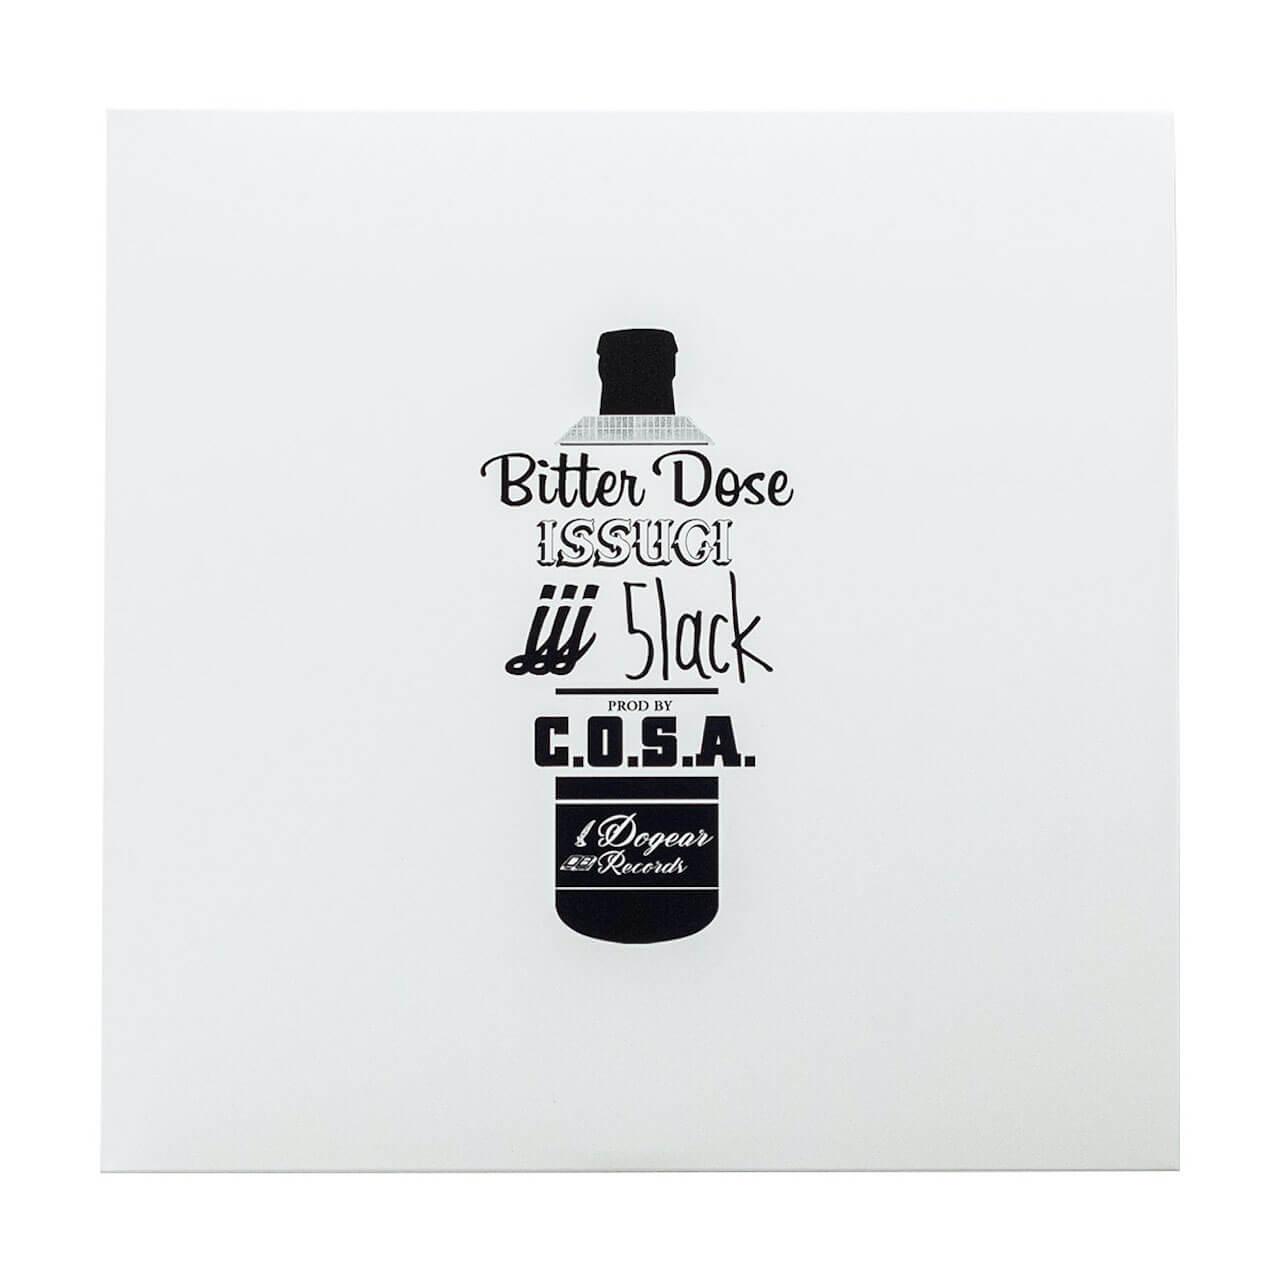 ISSUGI、JJJ、5lackによるシングル「Bitter Dose」prod C.O.S.A.が7インチでリリース music201023-issugi-jjj-5lack-cosa-1